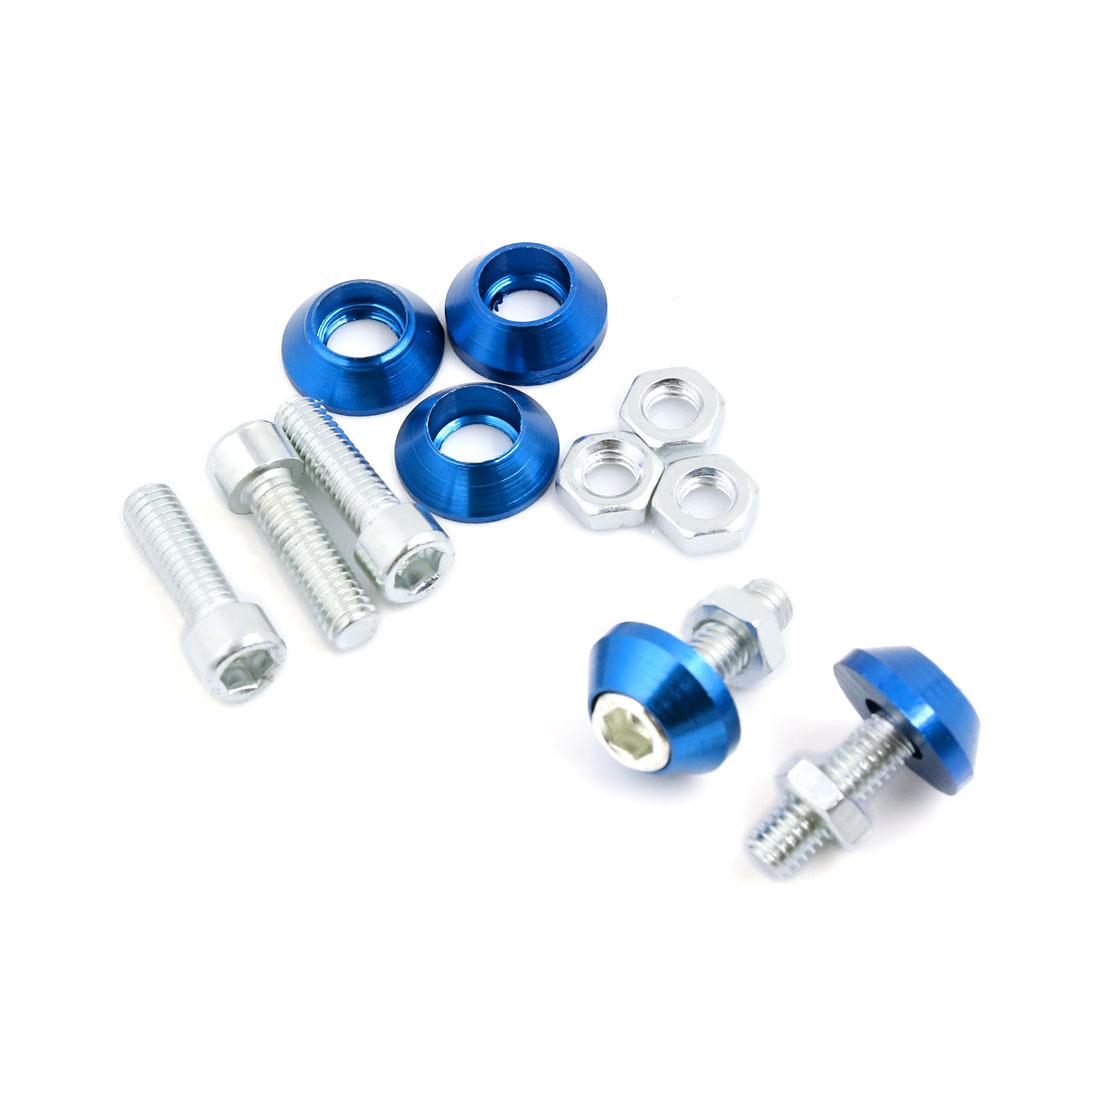 6mm Thread Dia Blue Cone Head License Plate Frame Nut Screw Ornament 5pcs